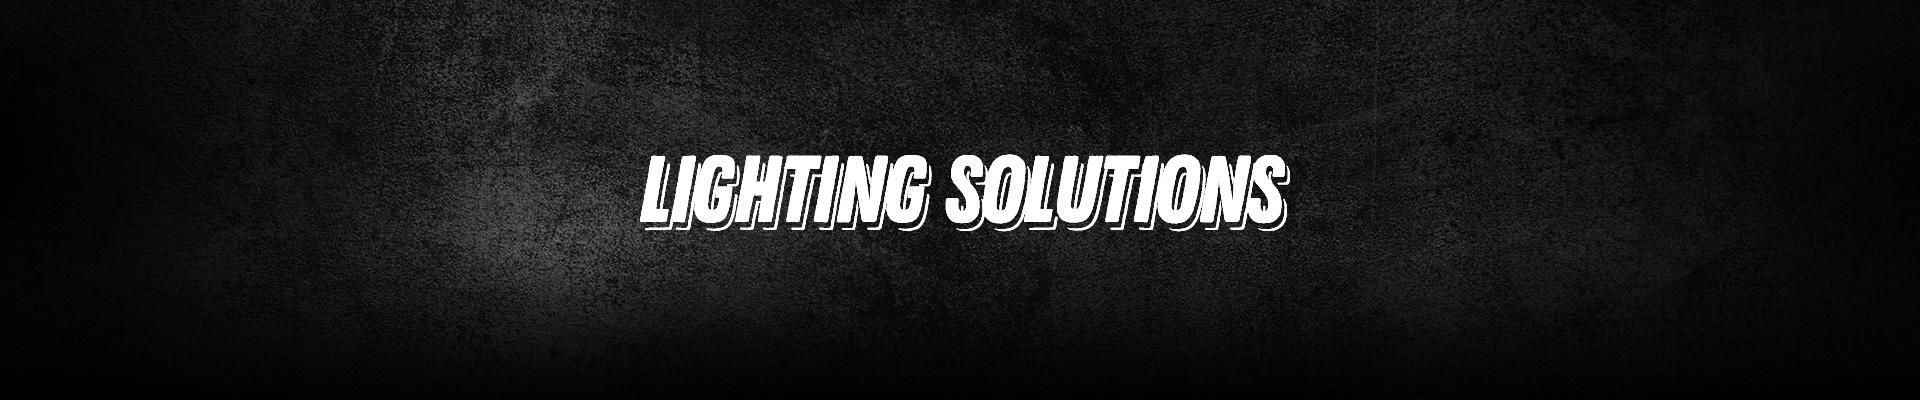 lighting-solutions.jpg